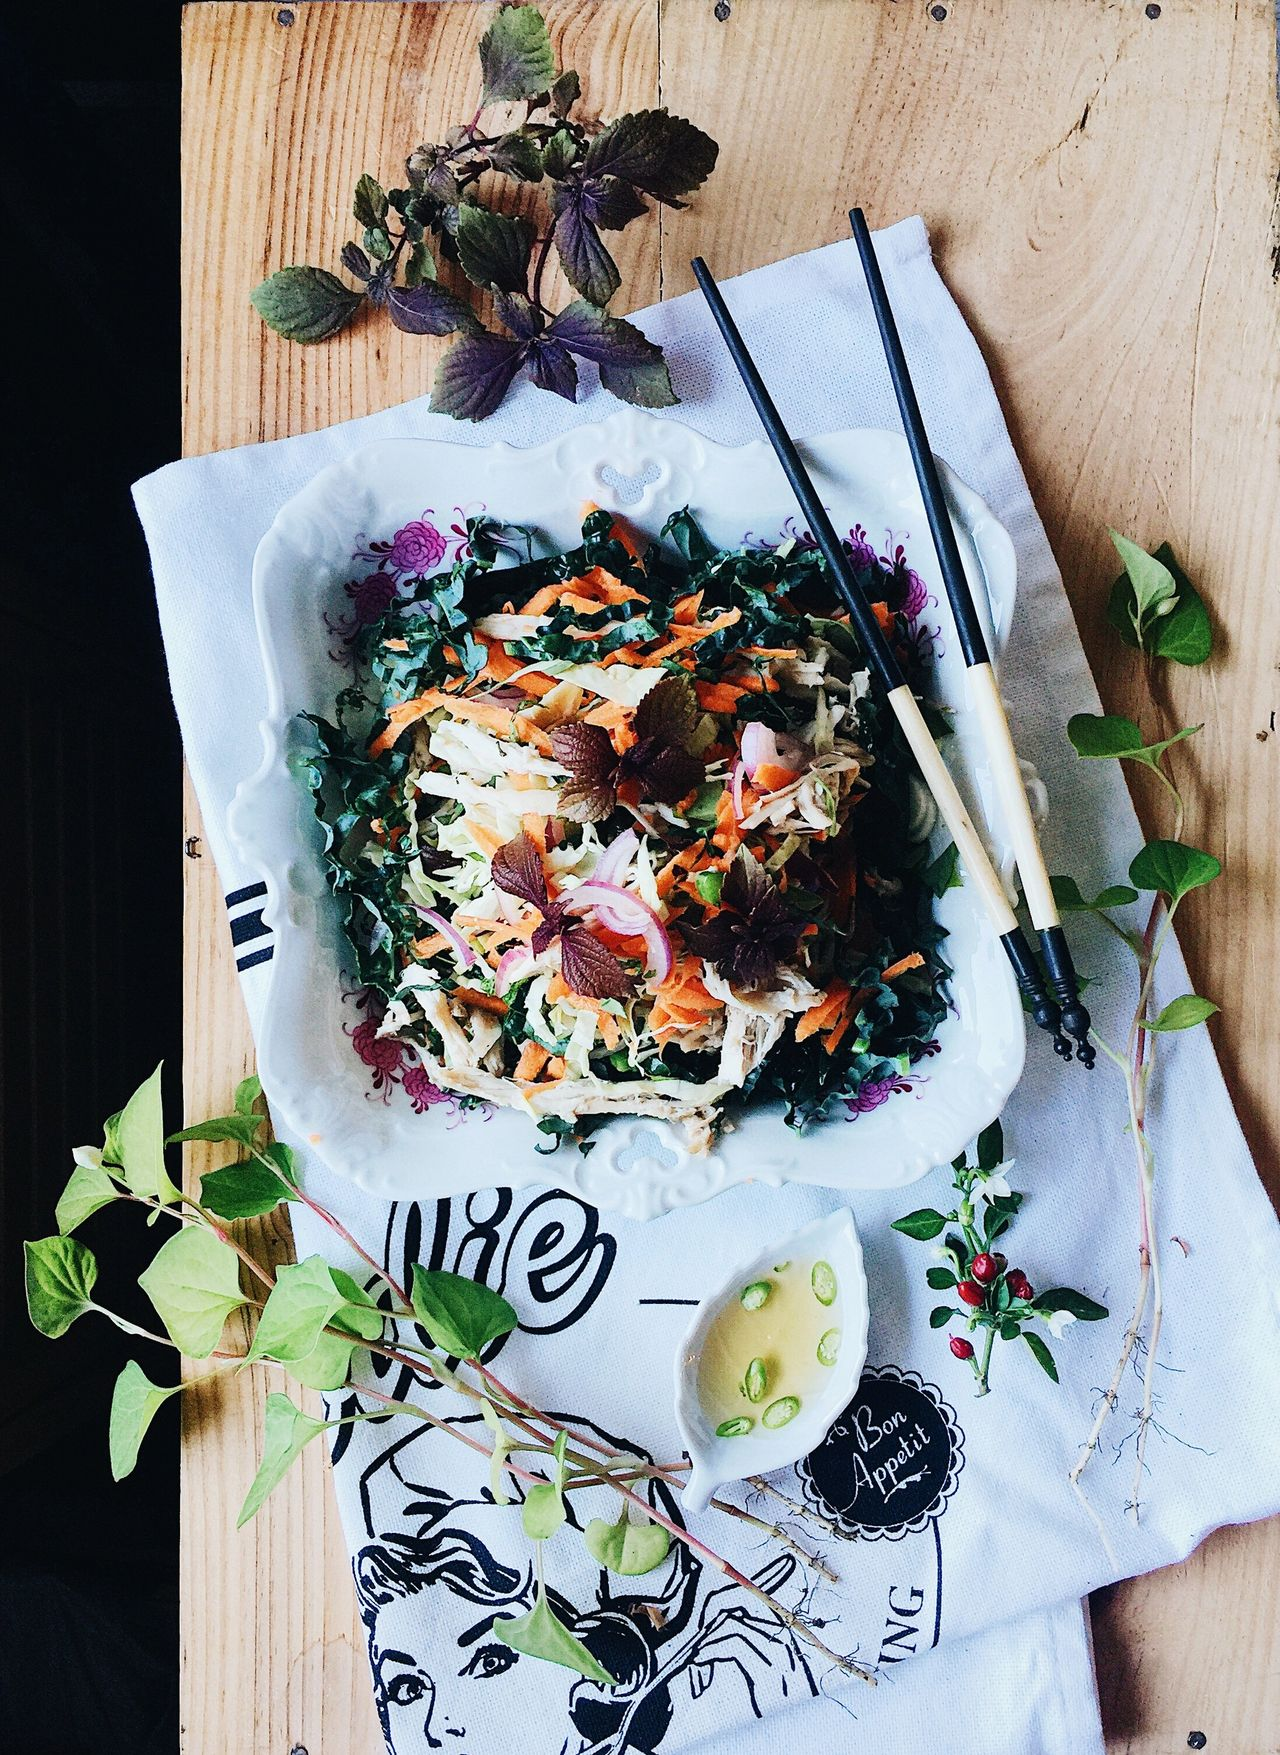 Supergreens Vietnamese Coleslaw with Roast Chicken